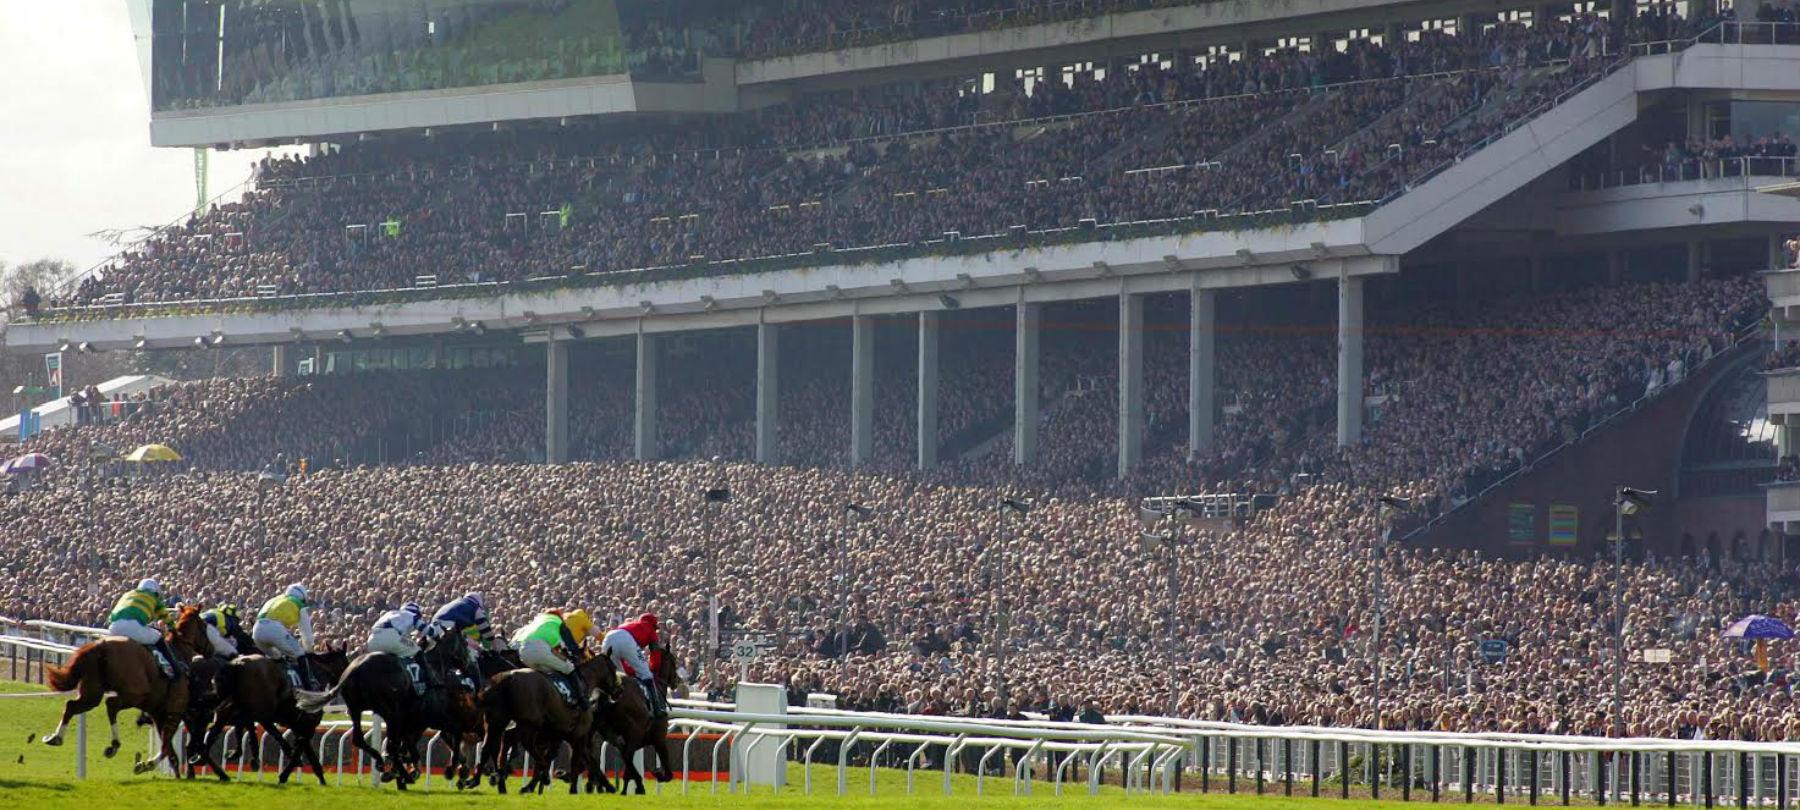 Copy of horses-racing-grandstand-hero.jpg